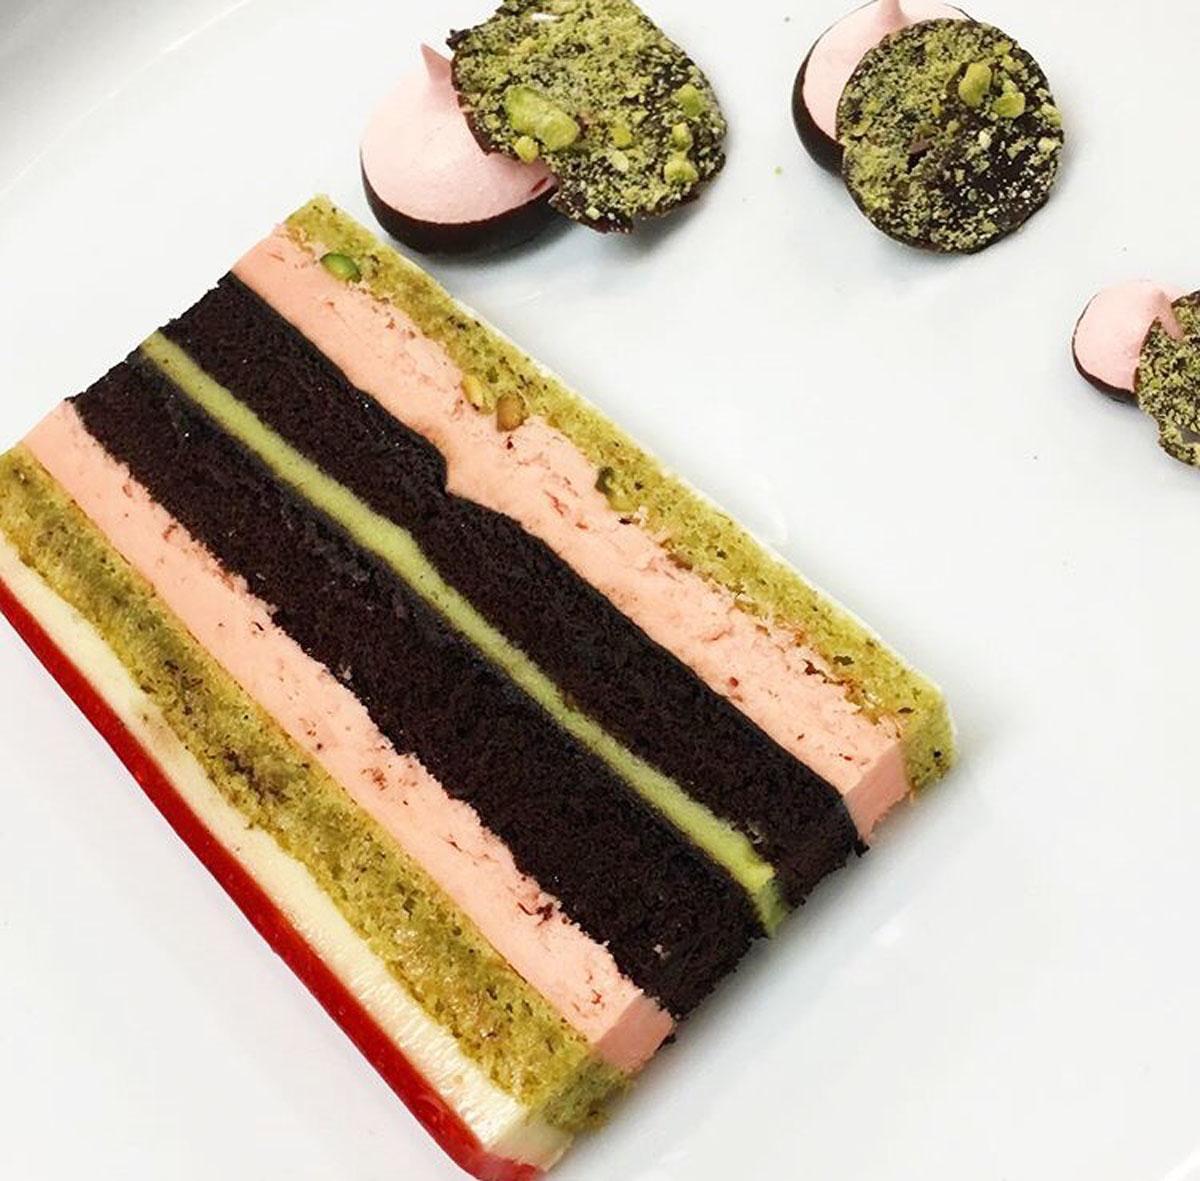 Stunning dessert display